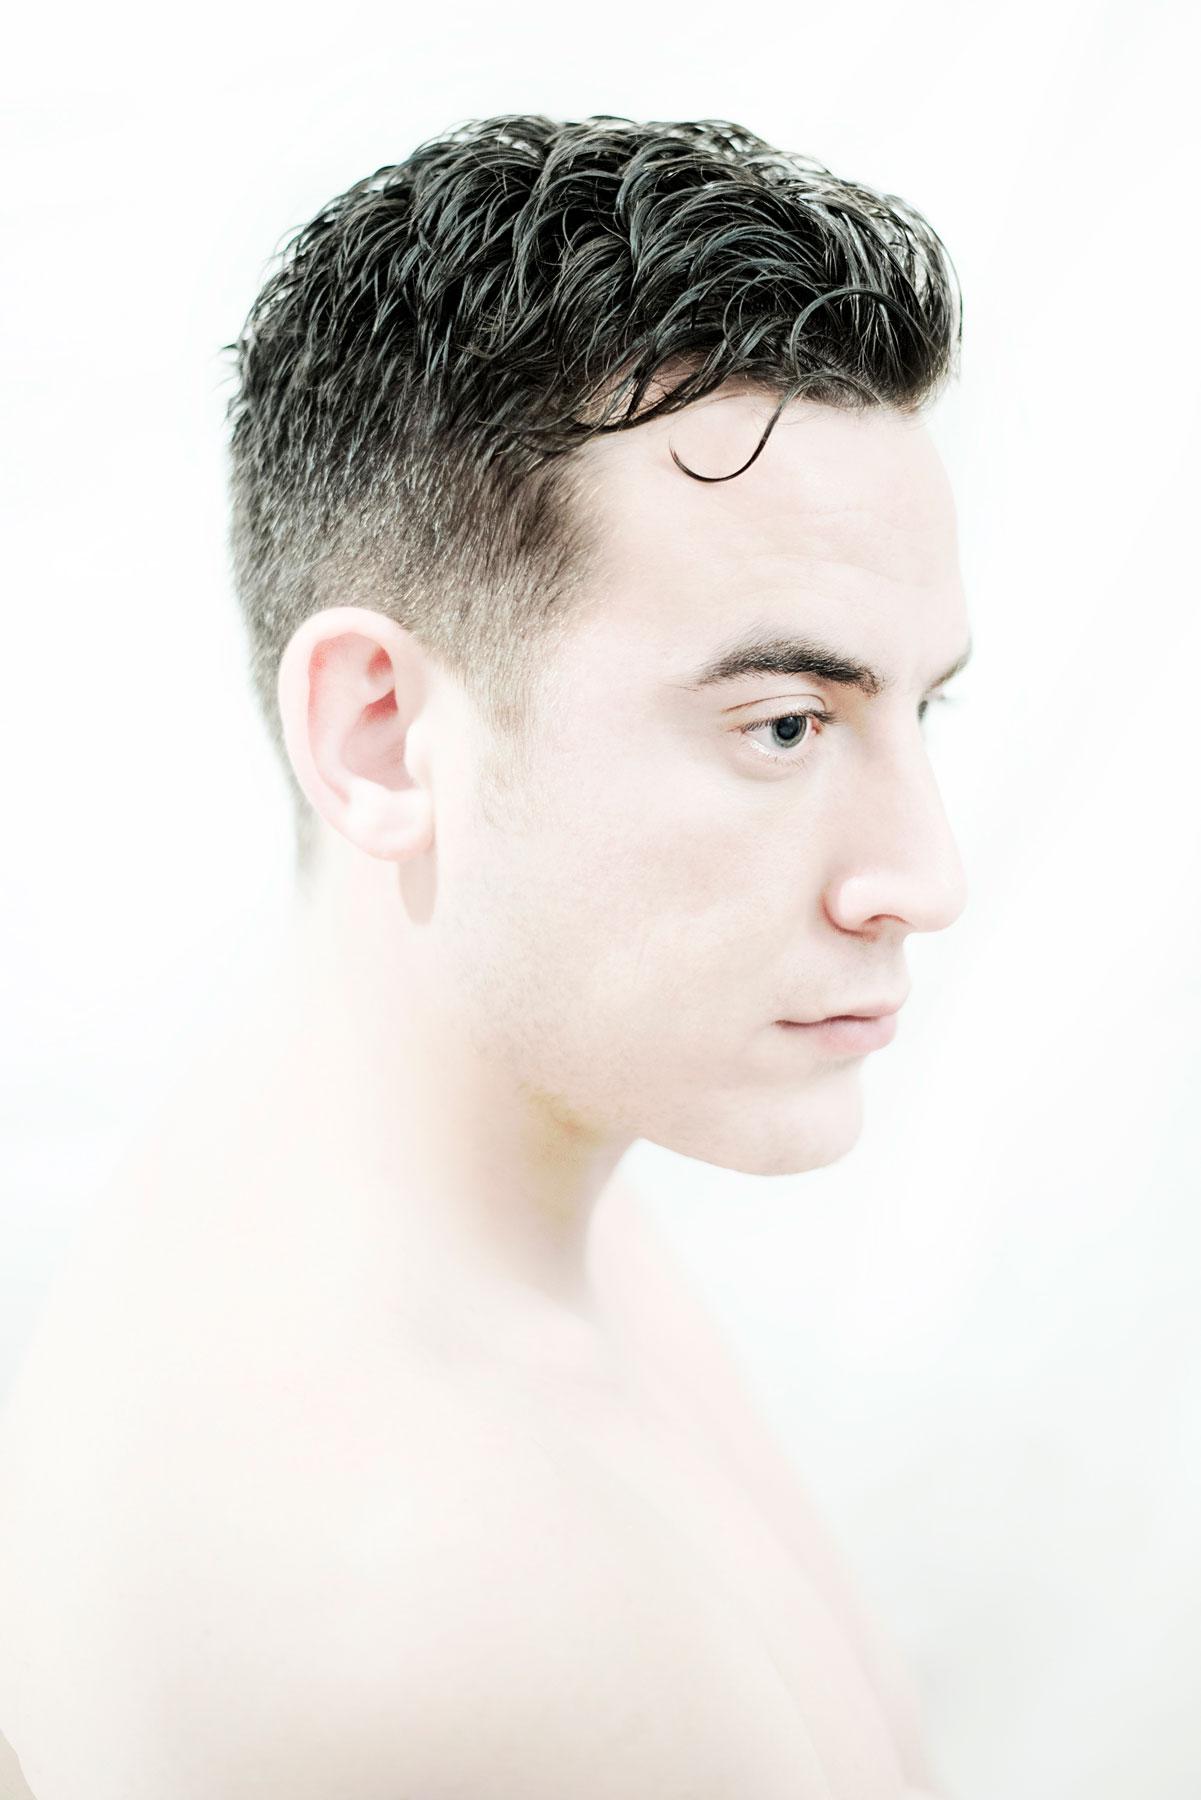 white-portrait-young-man.jpg